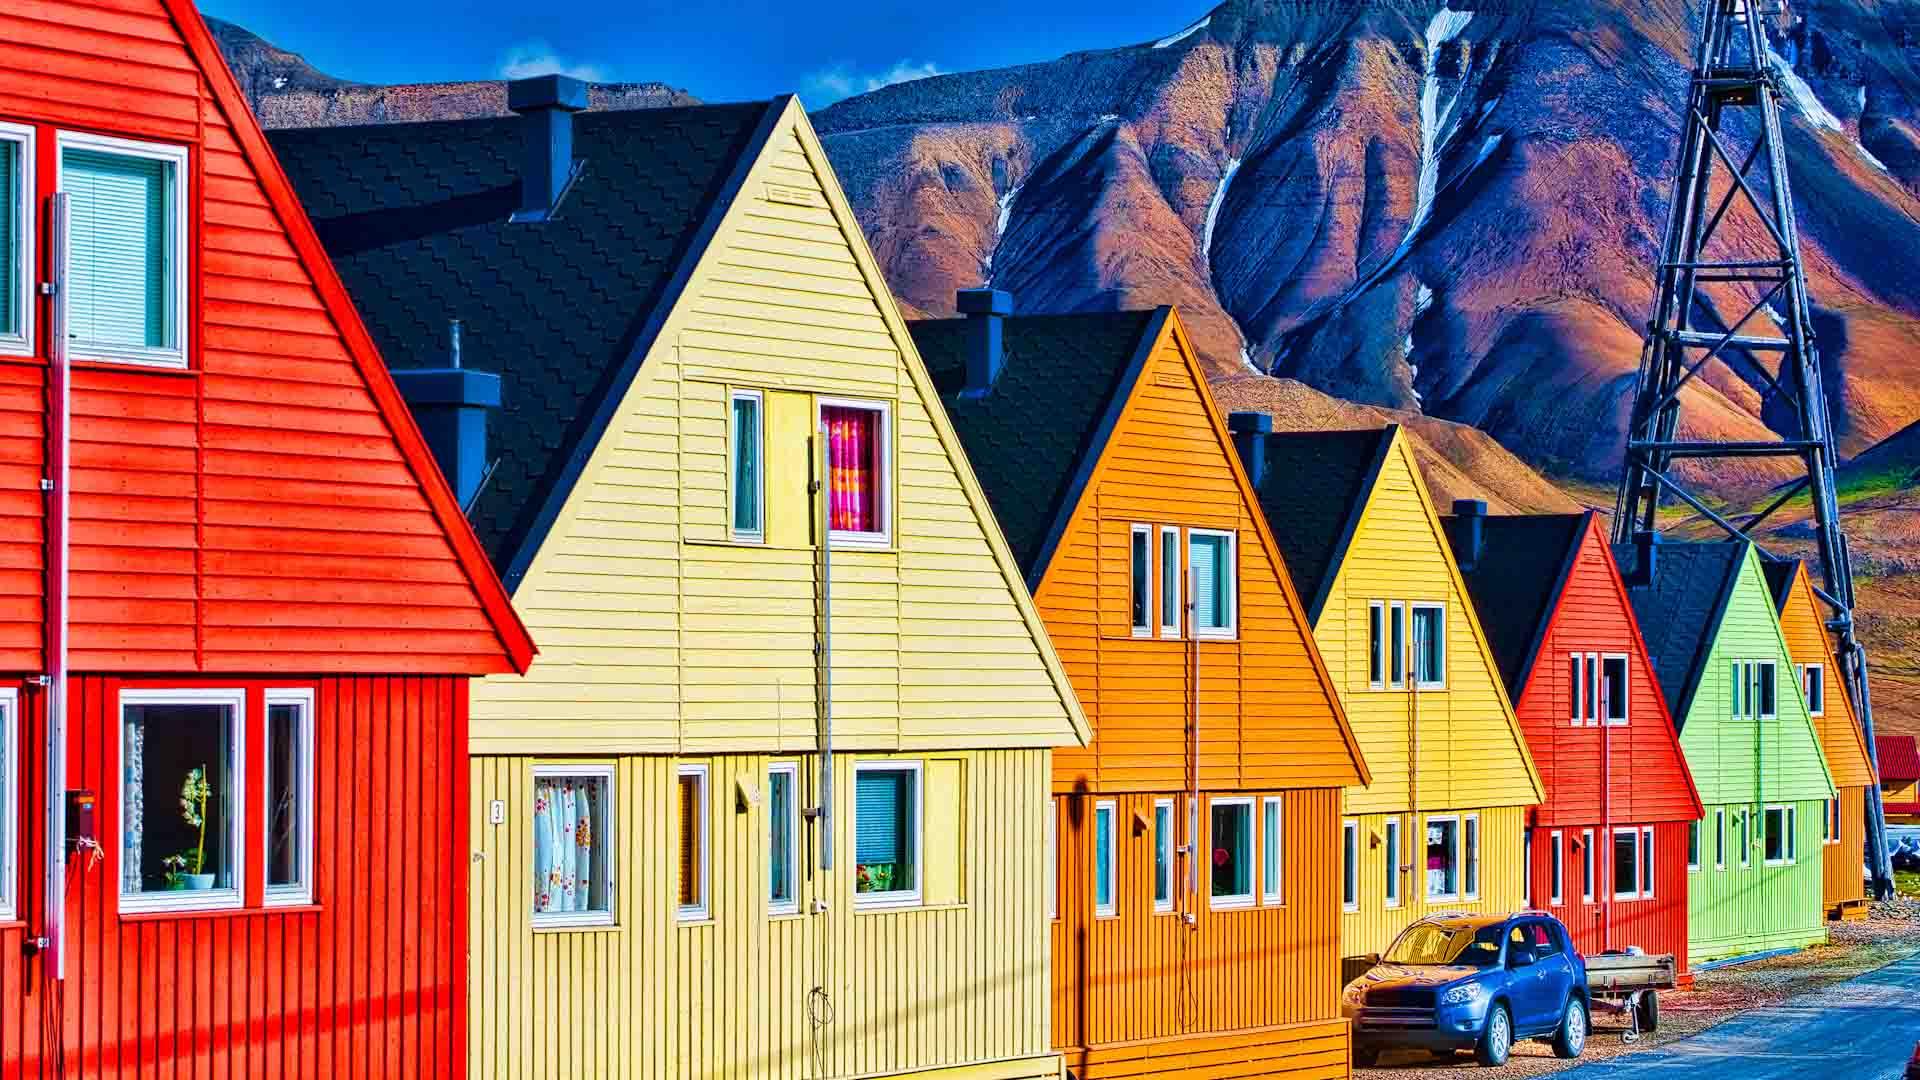 nws svalbard arctic longyearbyen